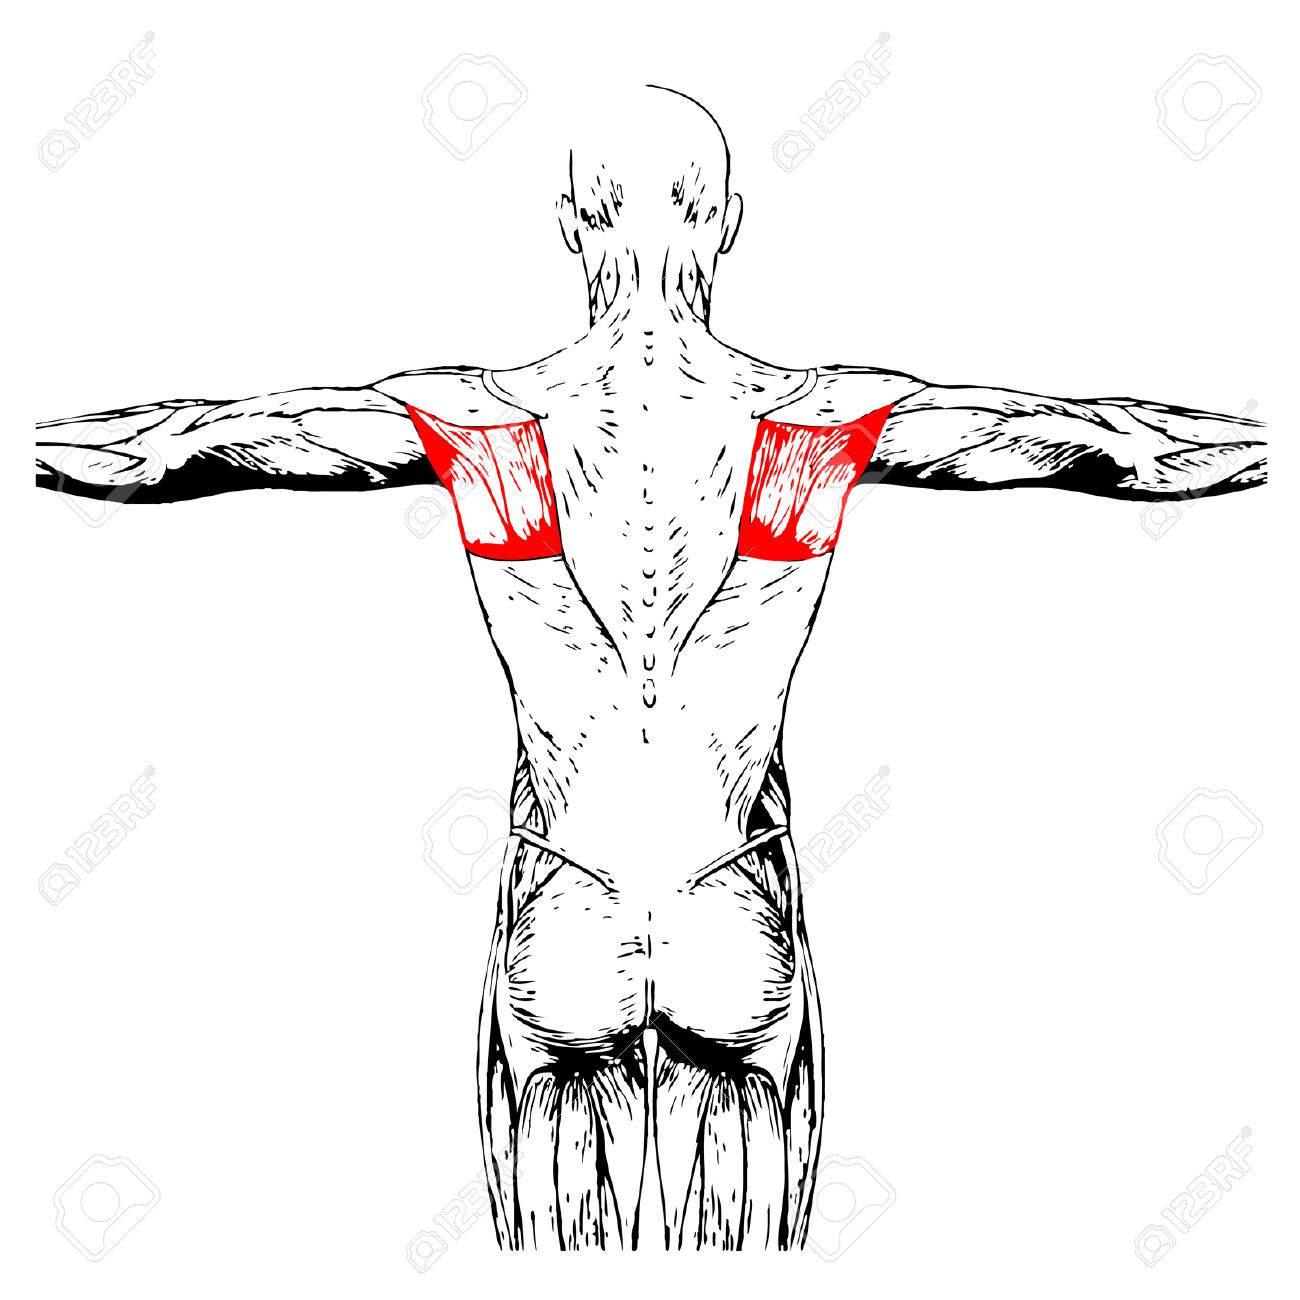 Fantastisch Kalb Anatomie Muskeln Ideen - Anatomie Ideen - finotti.info